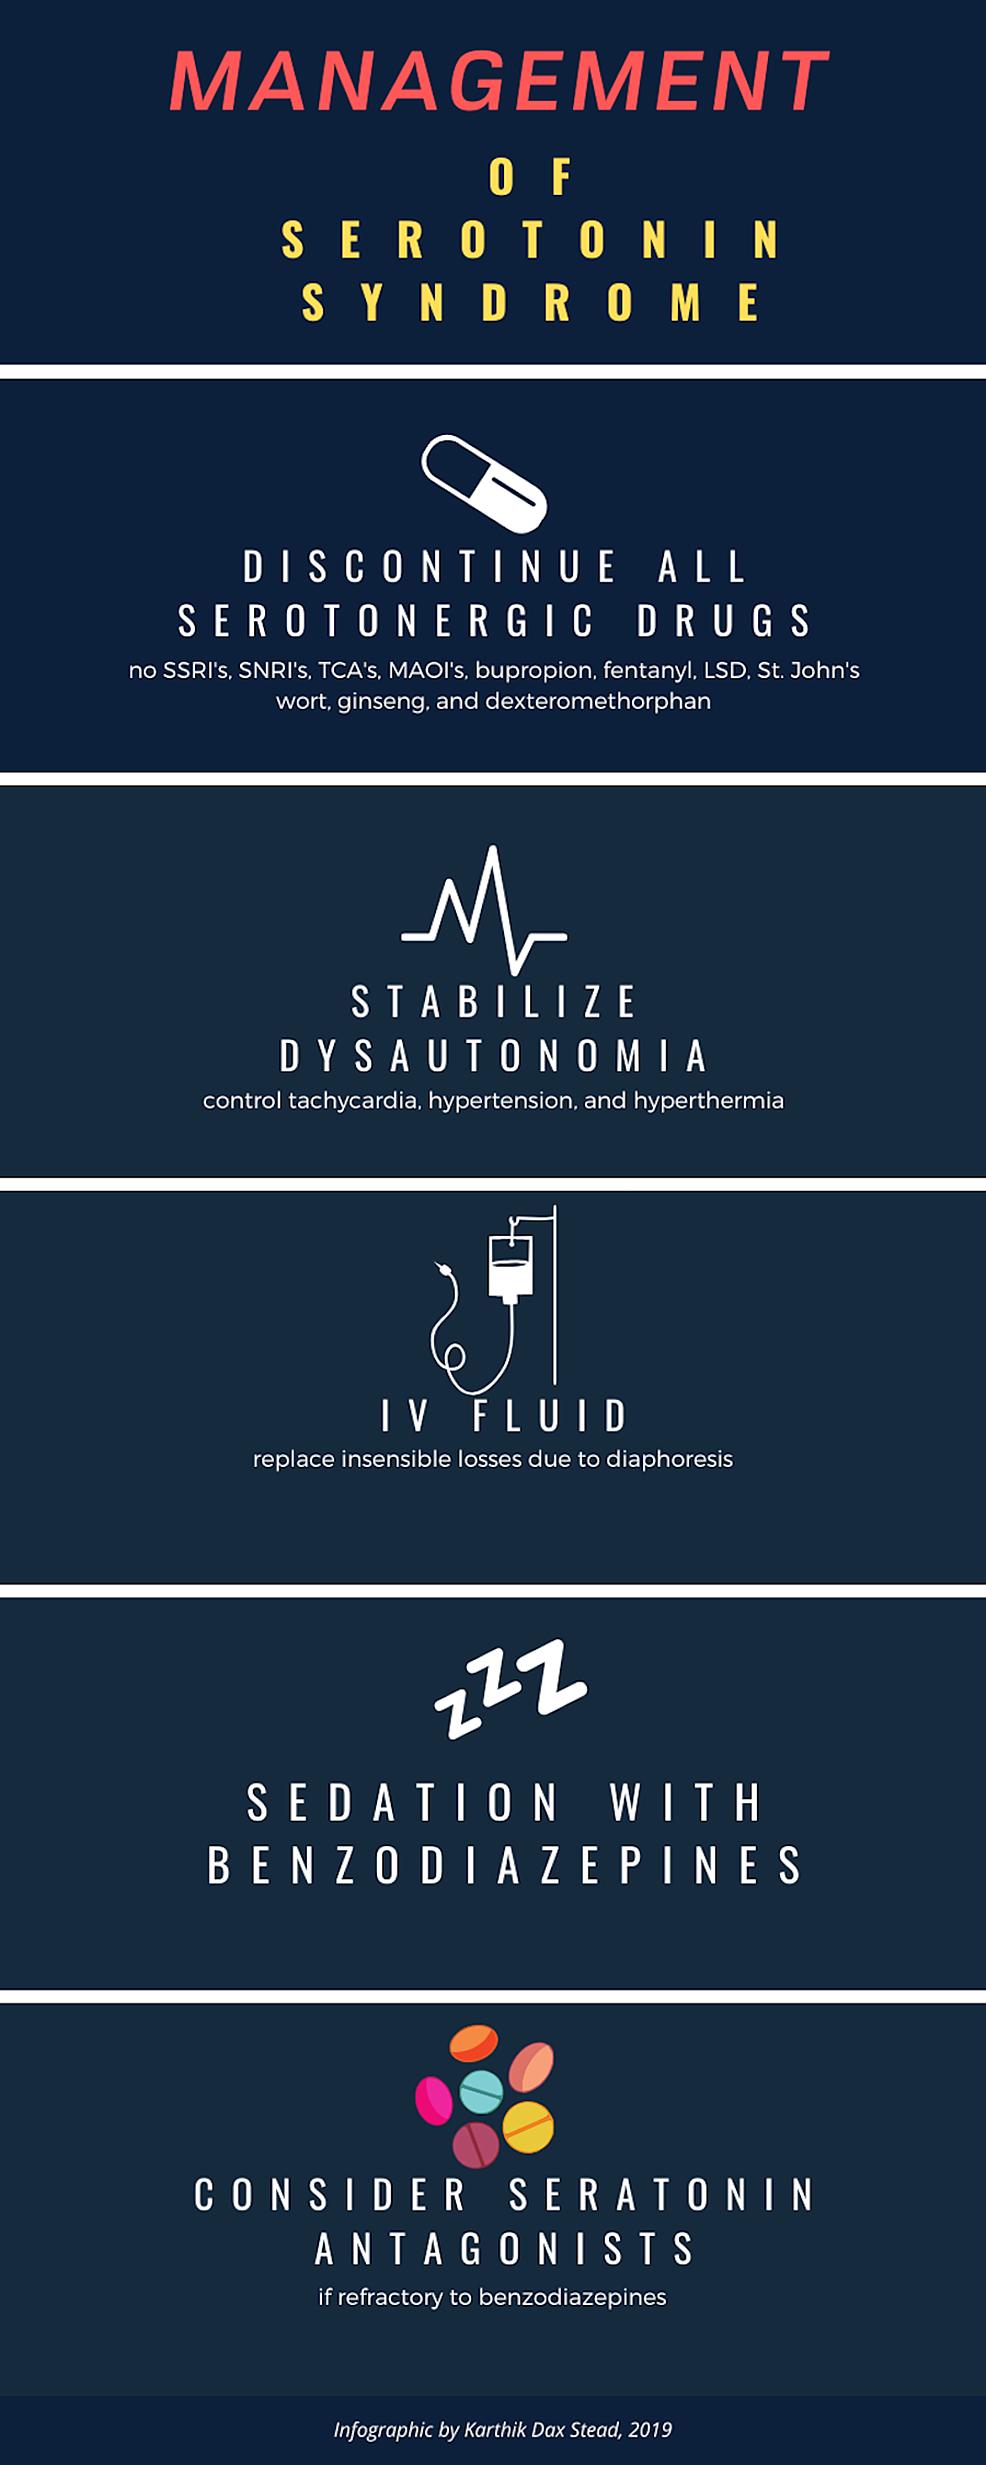 Management-of-serotonin-syndrome-